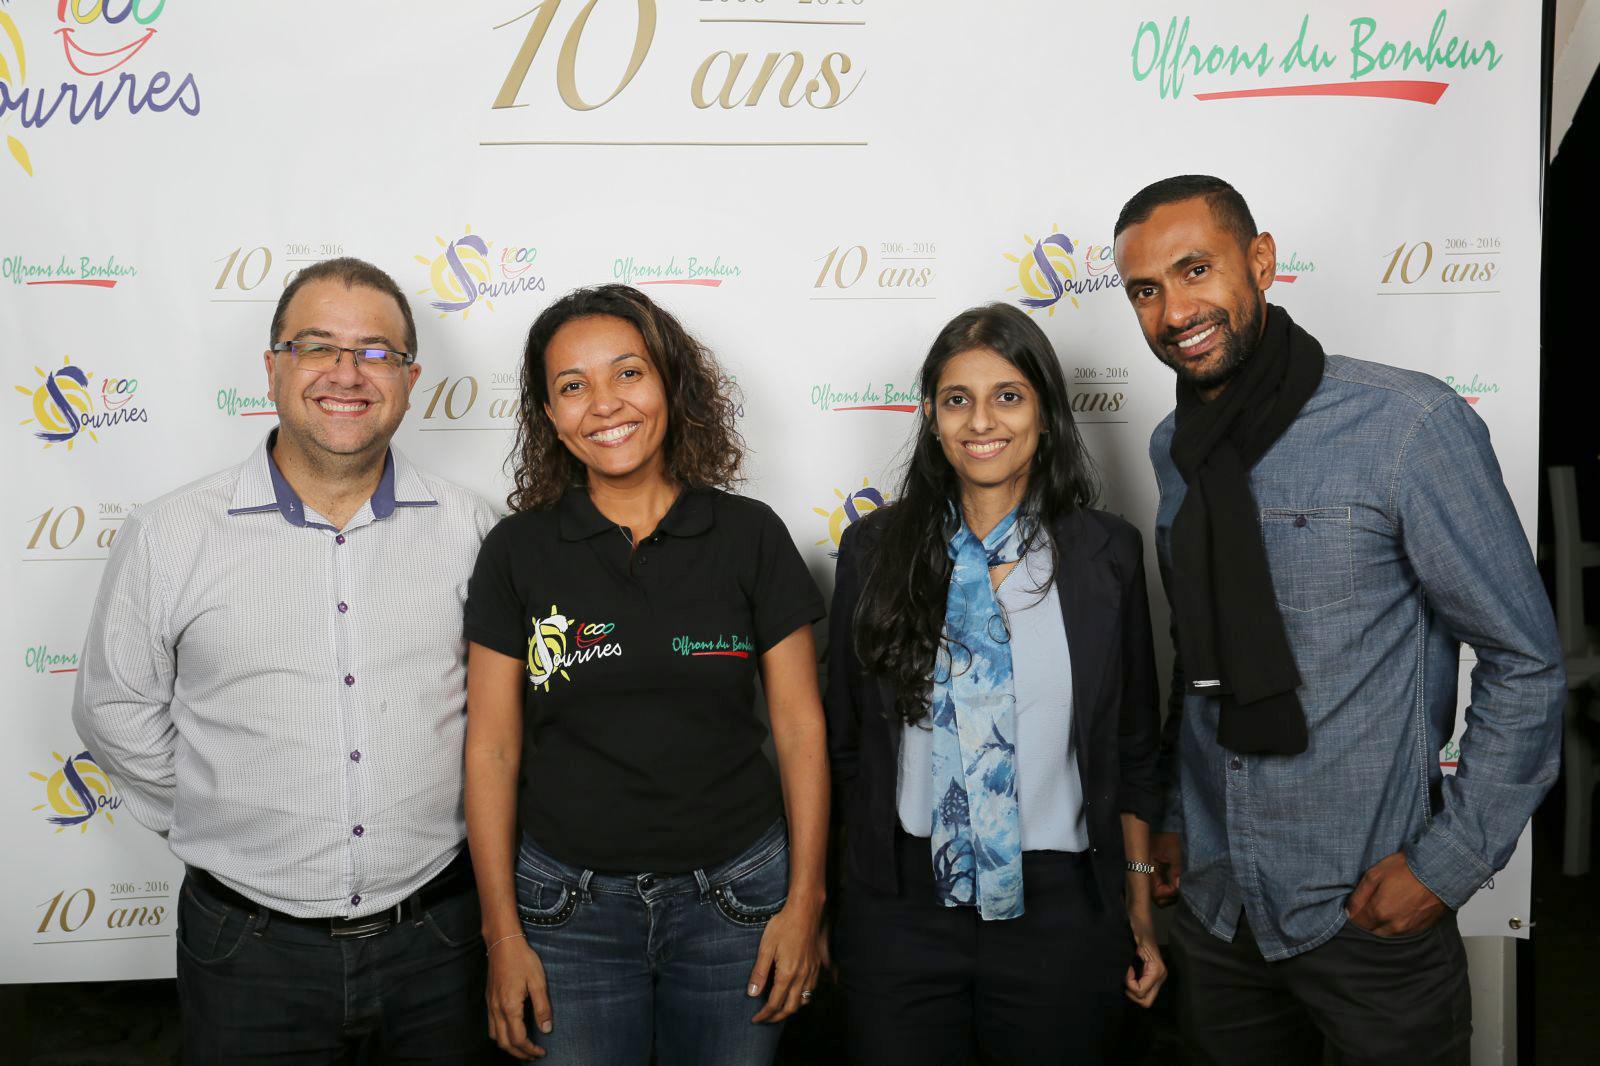 Eric Fontaine, Marie-Alice Sinaman, Nassima Omarjee et Ludovic Permalnaiken